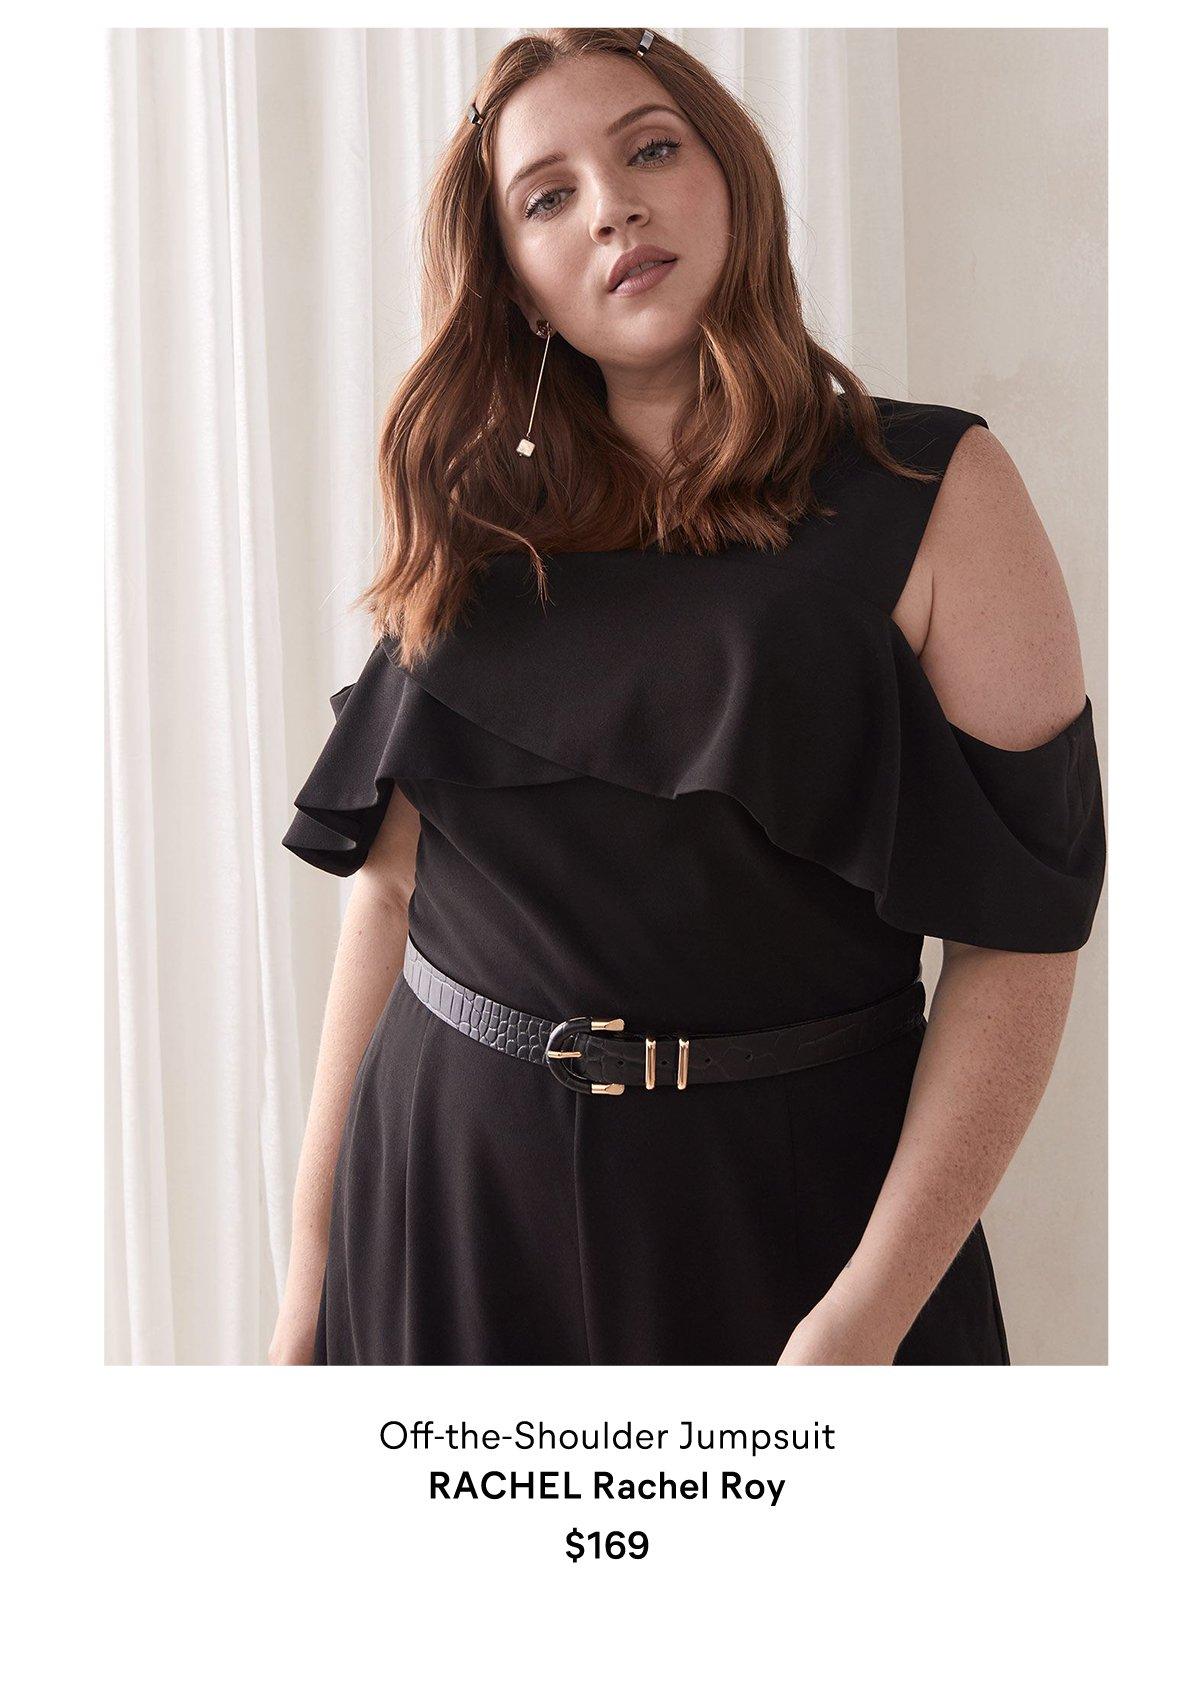 Off-the-Shoulder Jumpsuit - RACHEL Rachel Roy $169 $102